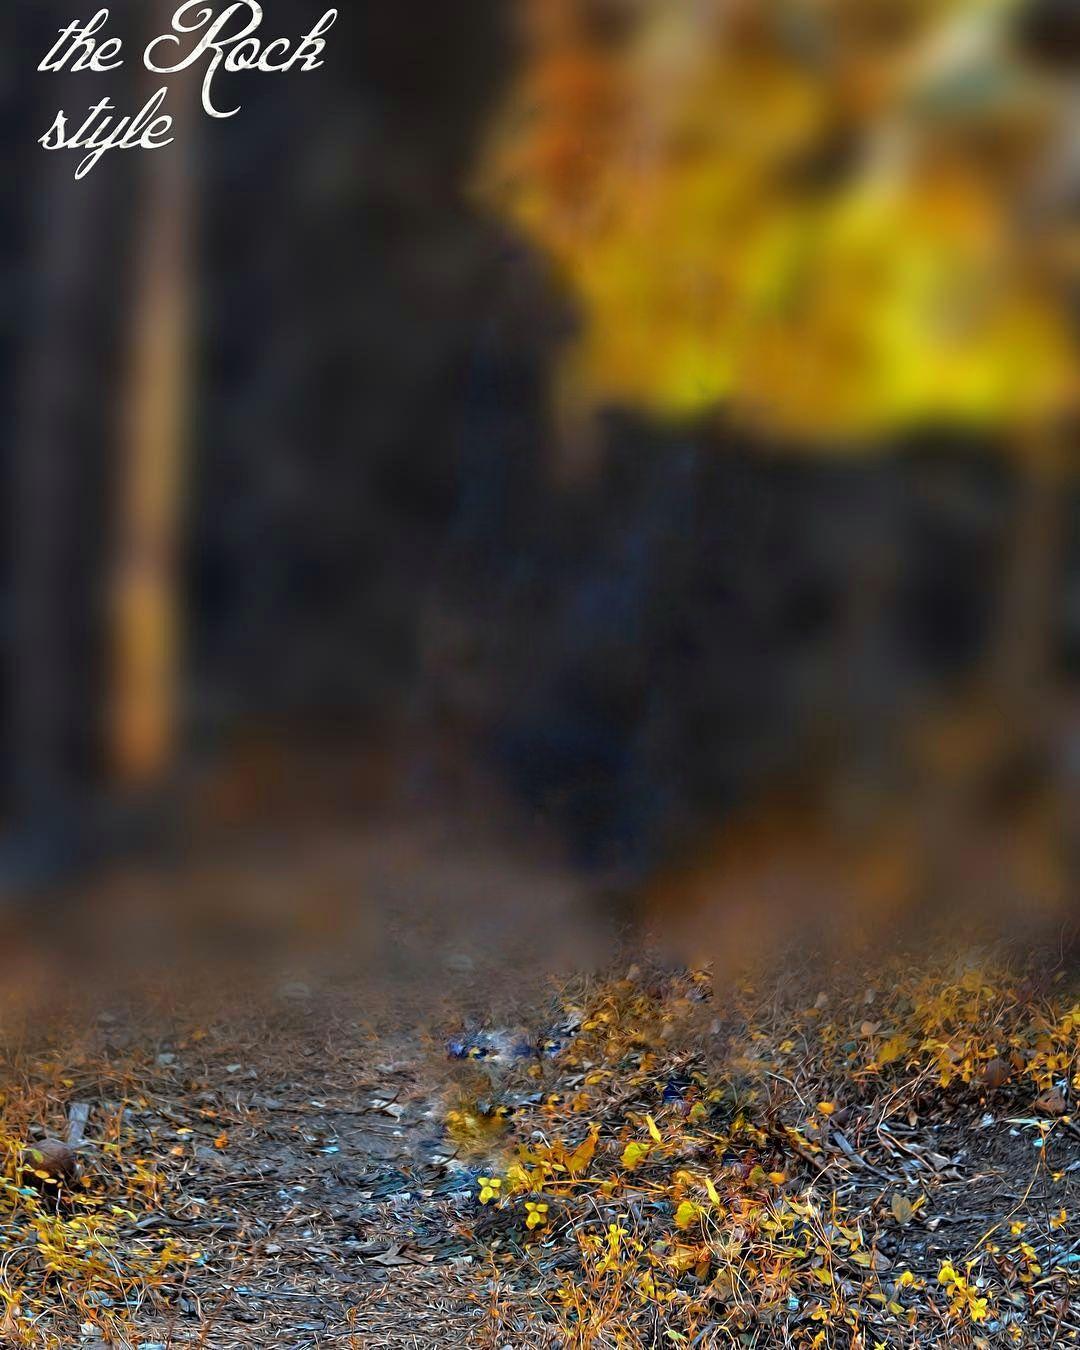 Nature Editing Picsart Hd Wallpaper Png Photo Download Background